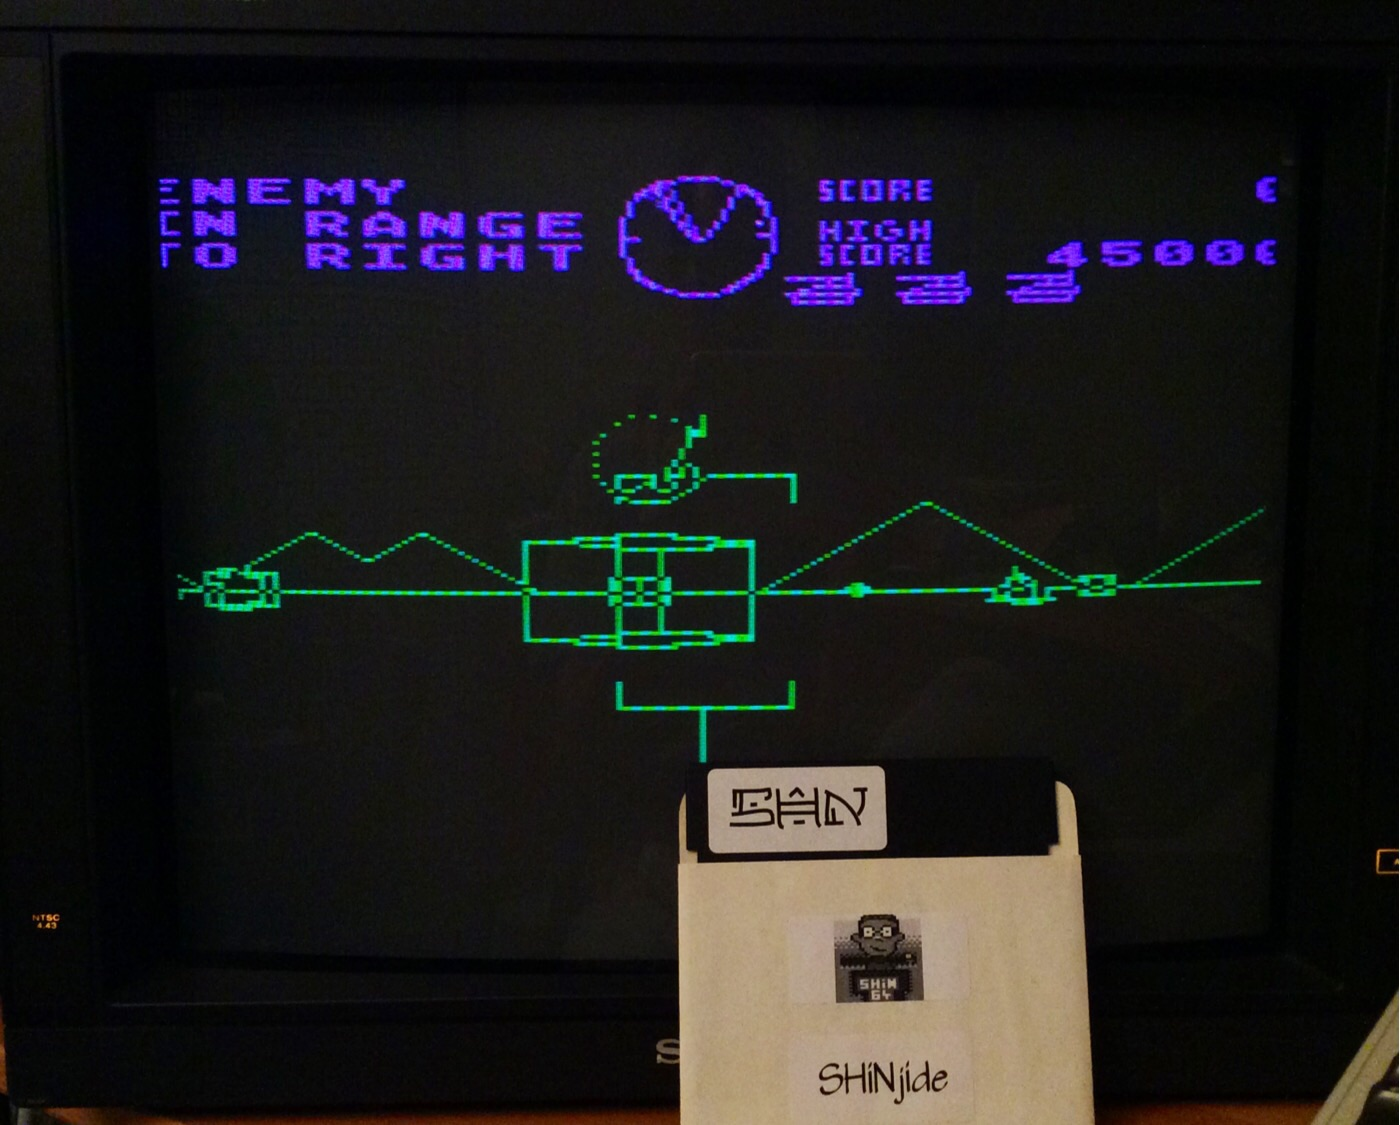 SHiNjide: Battlezone (Atari 400/800/XL/XE Emulated) 45,000 points on 2014-10-06 14:06:56